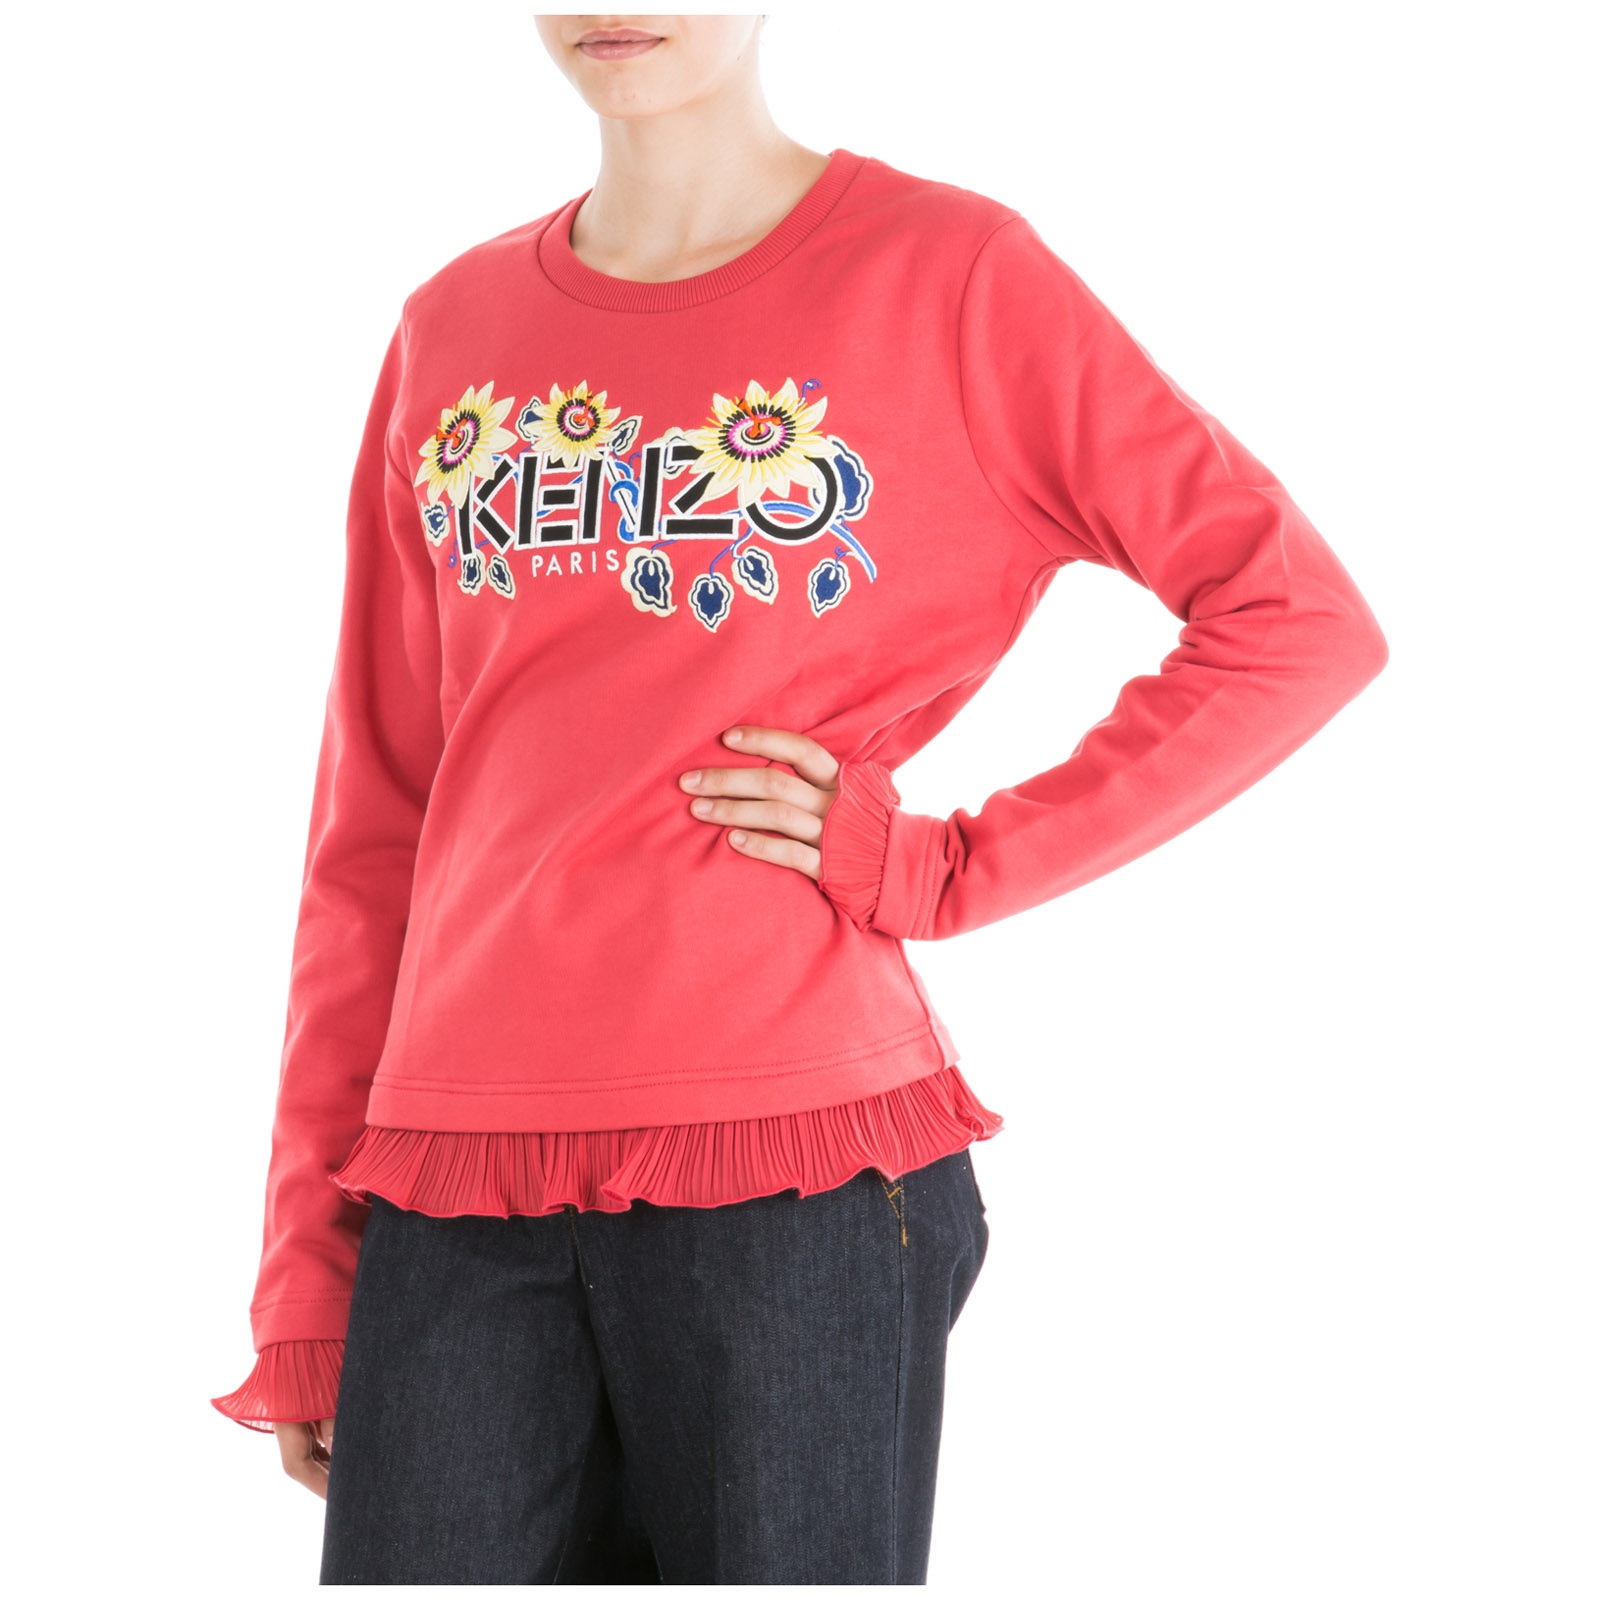 Sweatshirt Kenzo Damen BritishTown Yabancı Dil Kursu